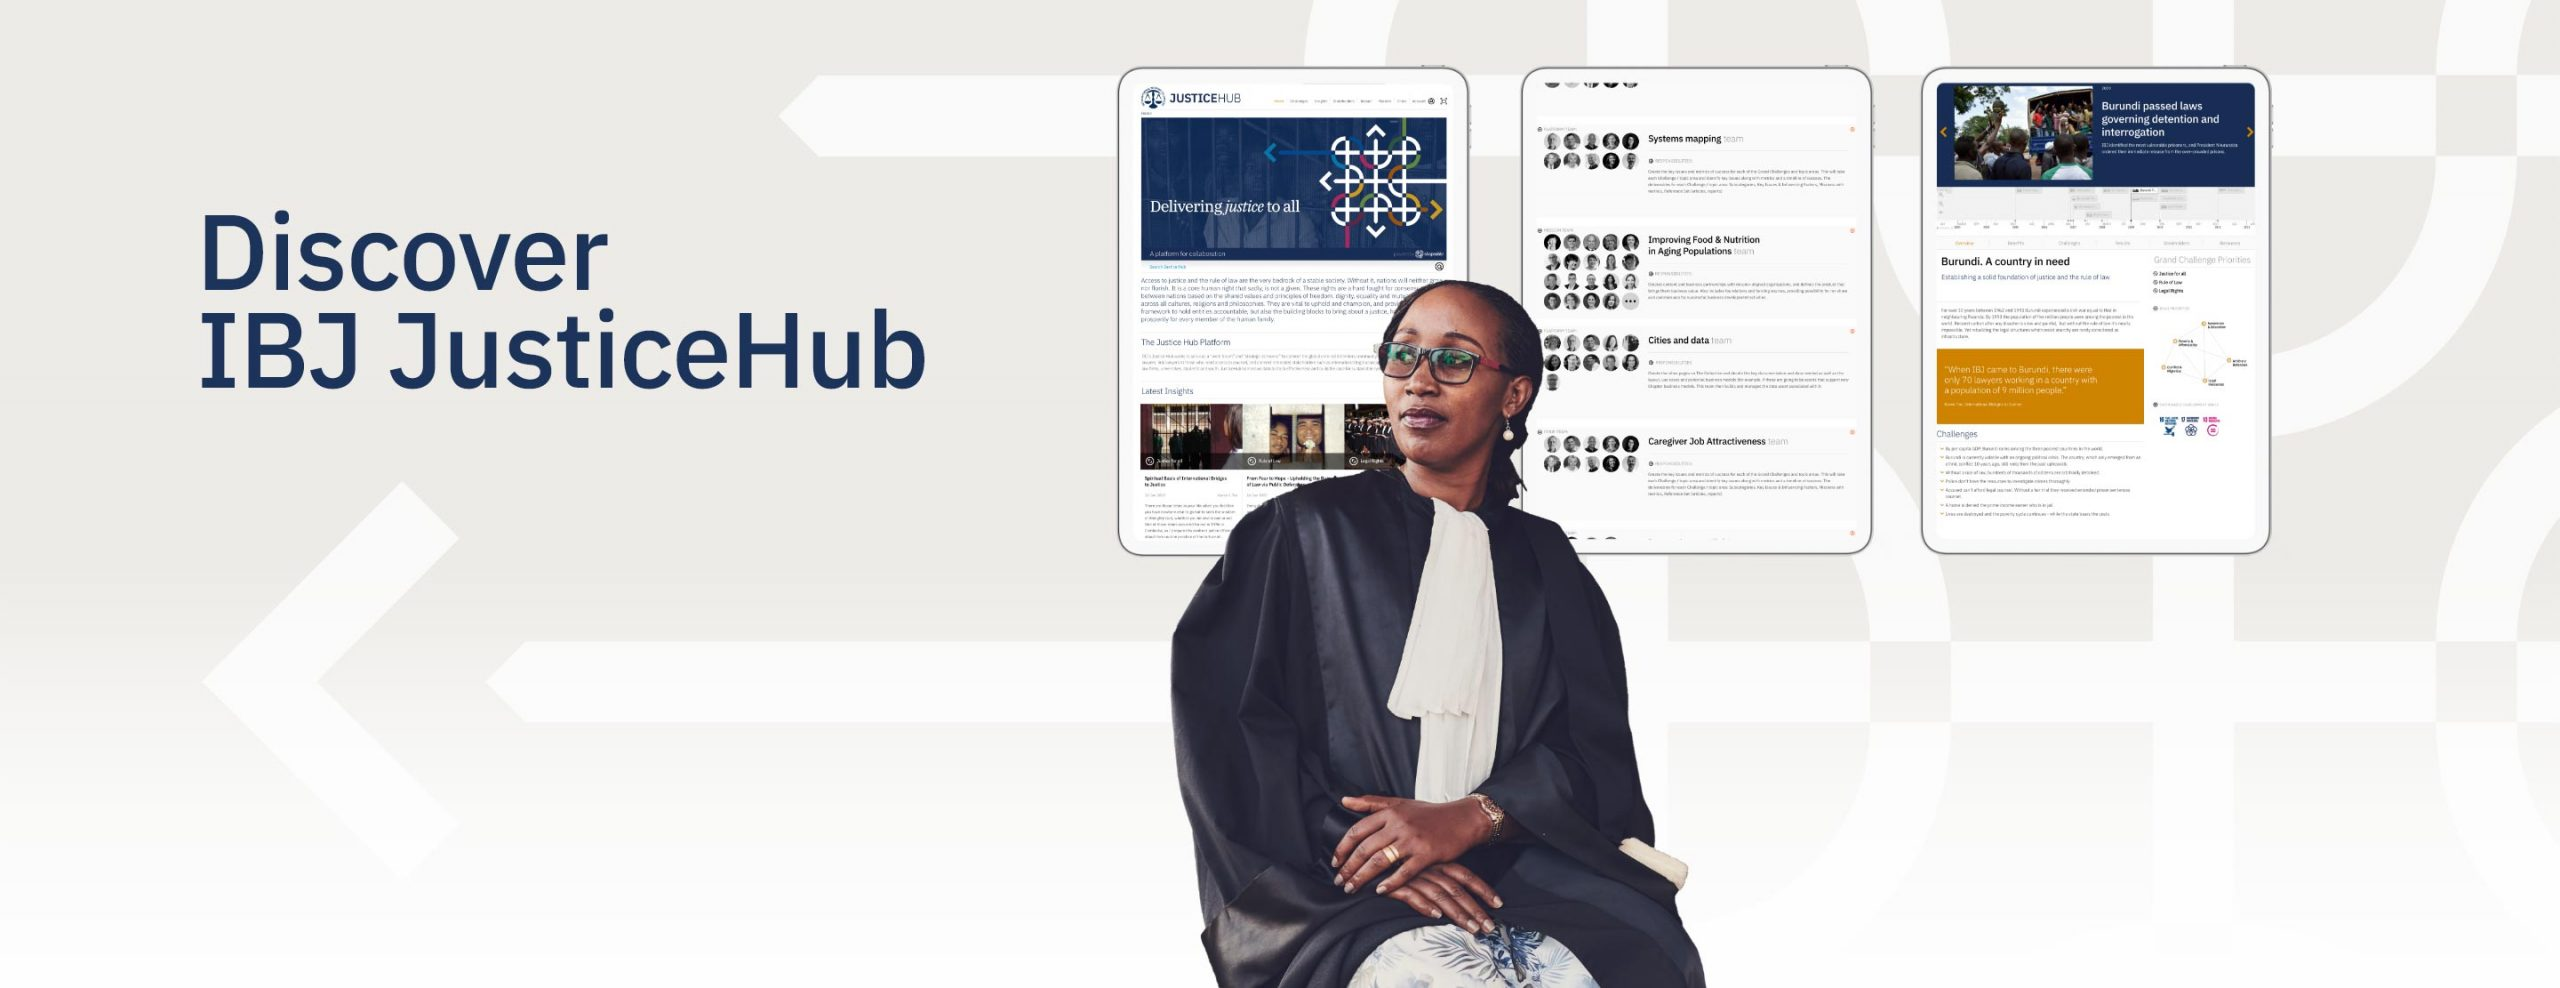 The JusticeHub Platform